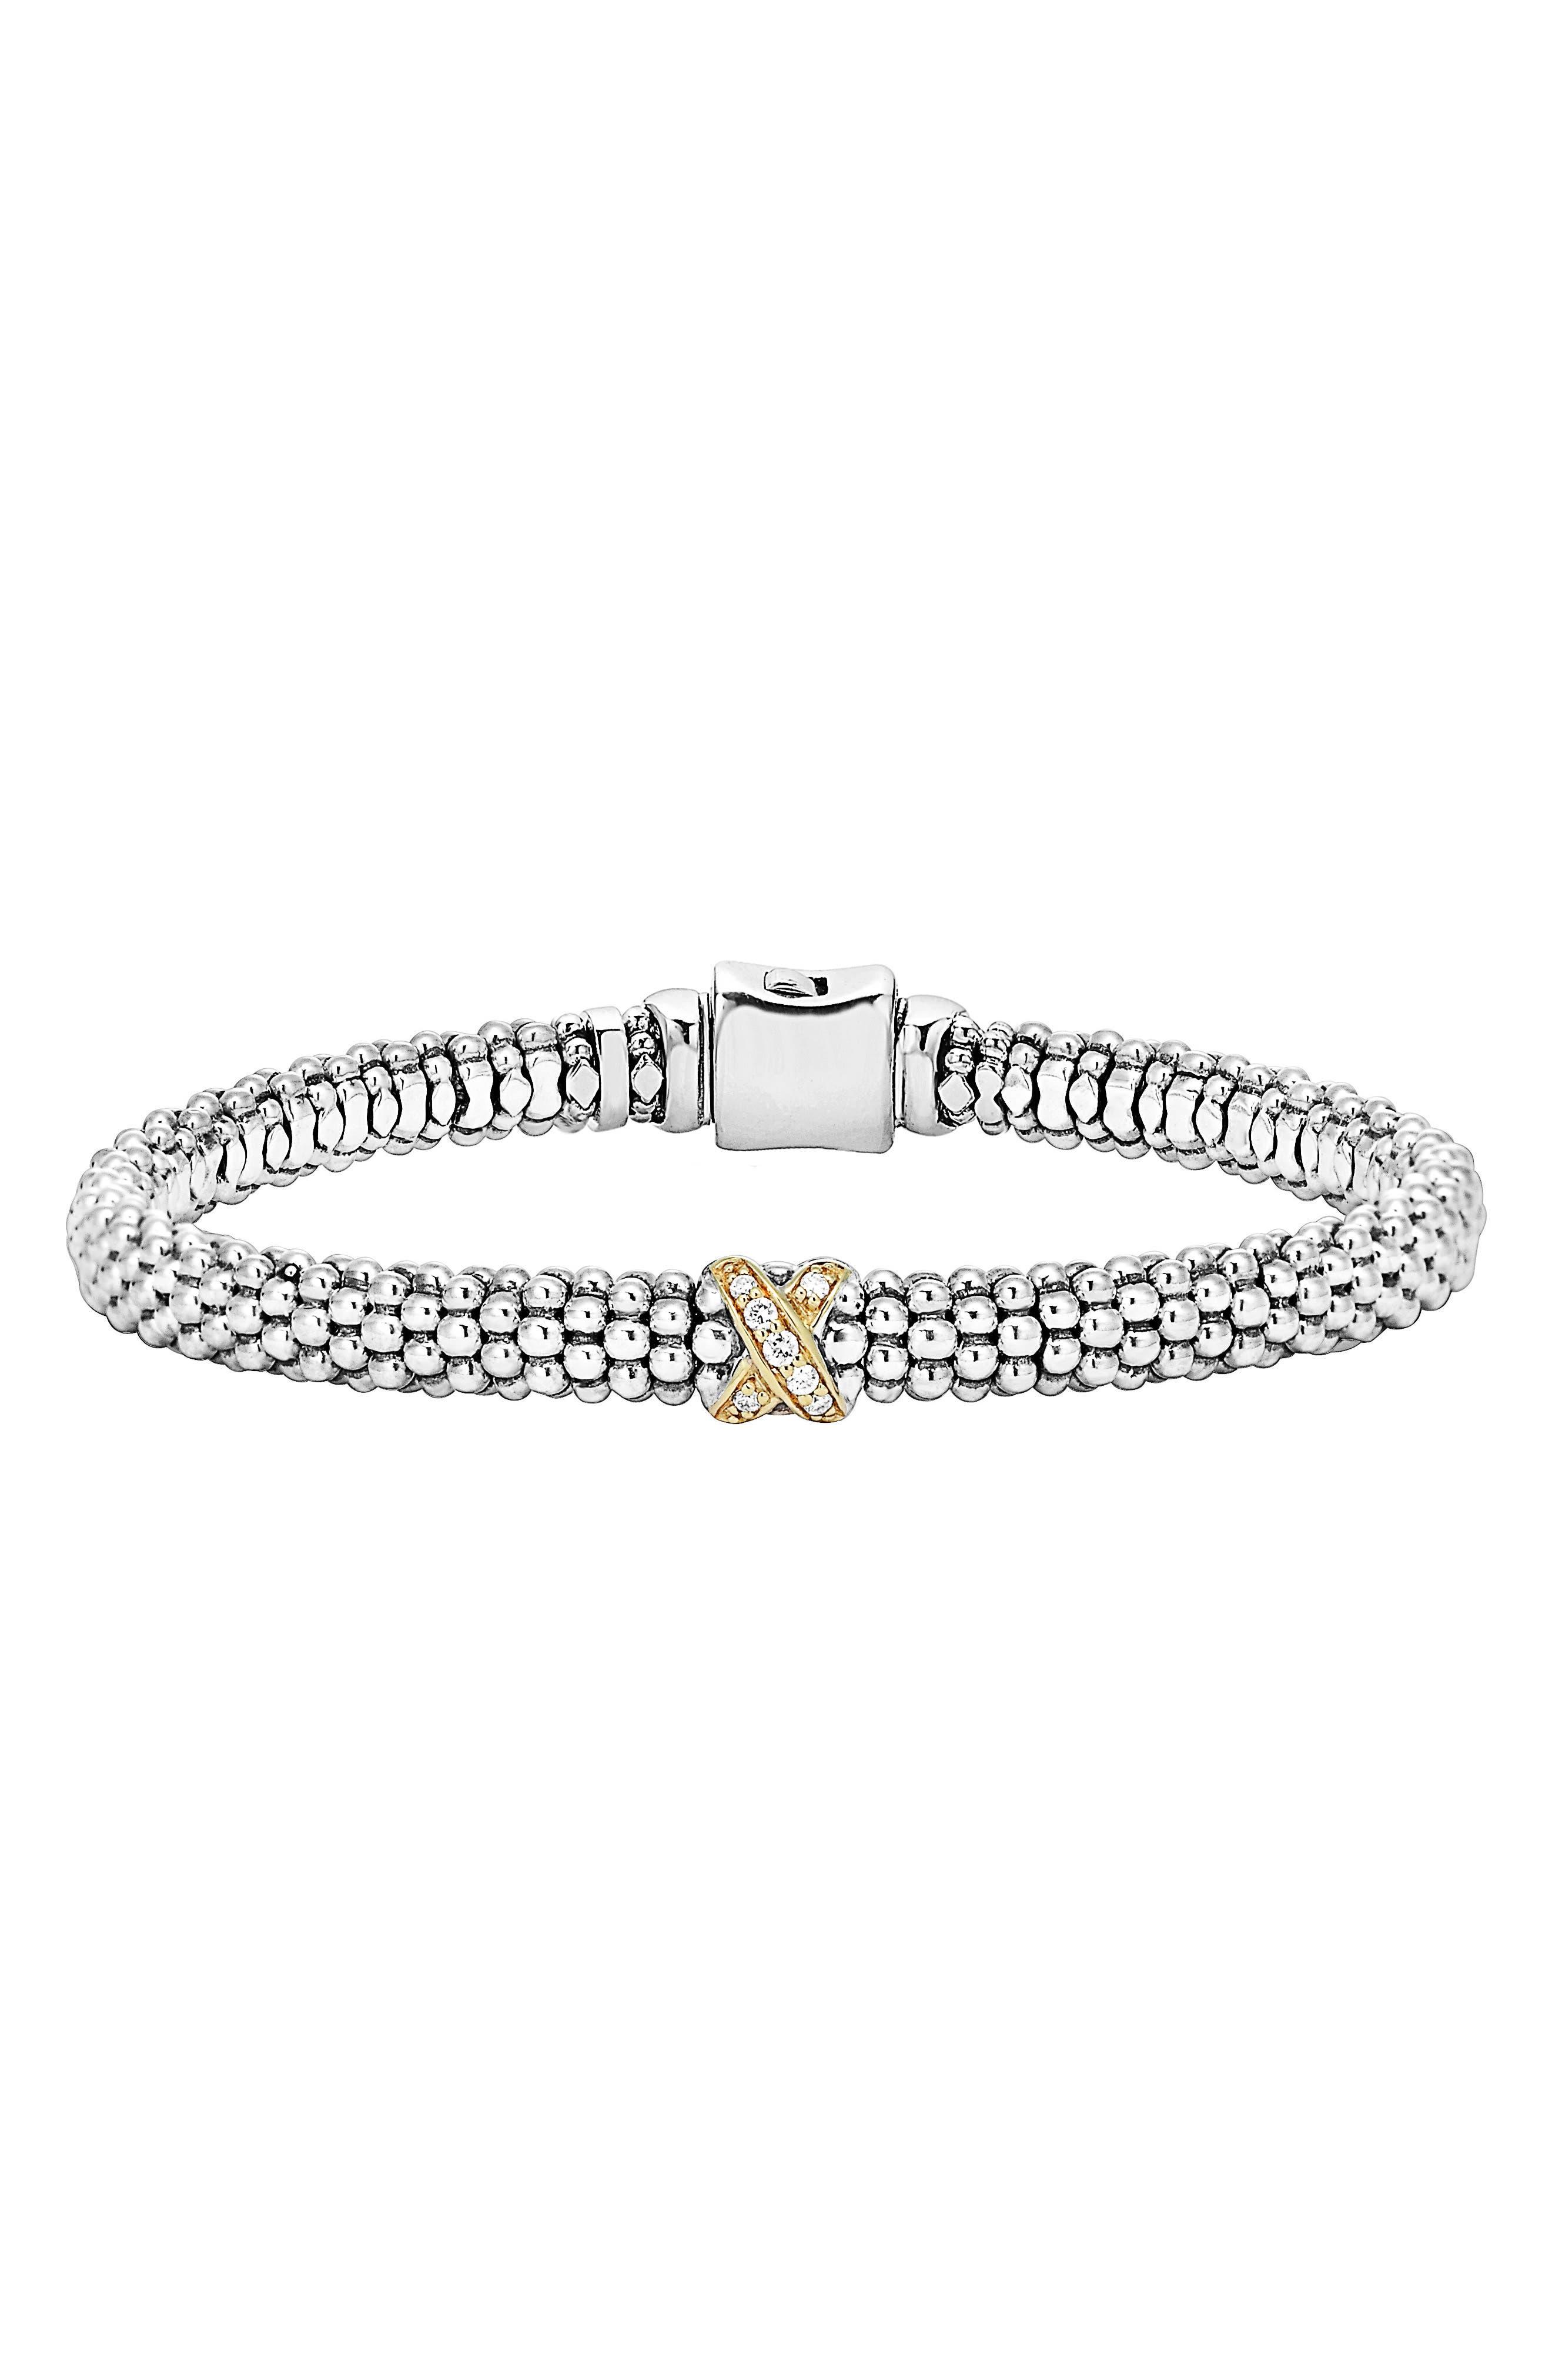 LAGOS, Caviar 'Signature Caviar' Diamond Rope Bracelet, Main thumbnail 1, color, STERLING SILVER/ GOLD